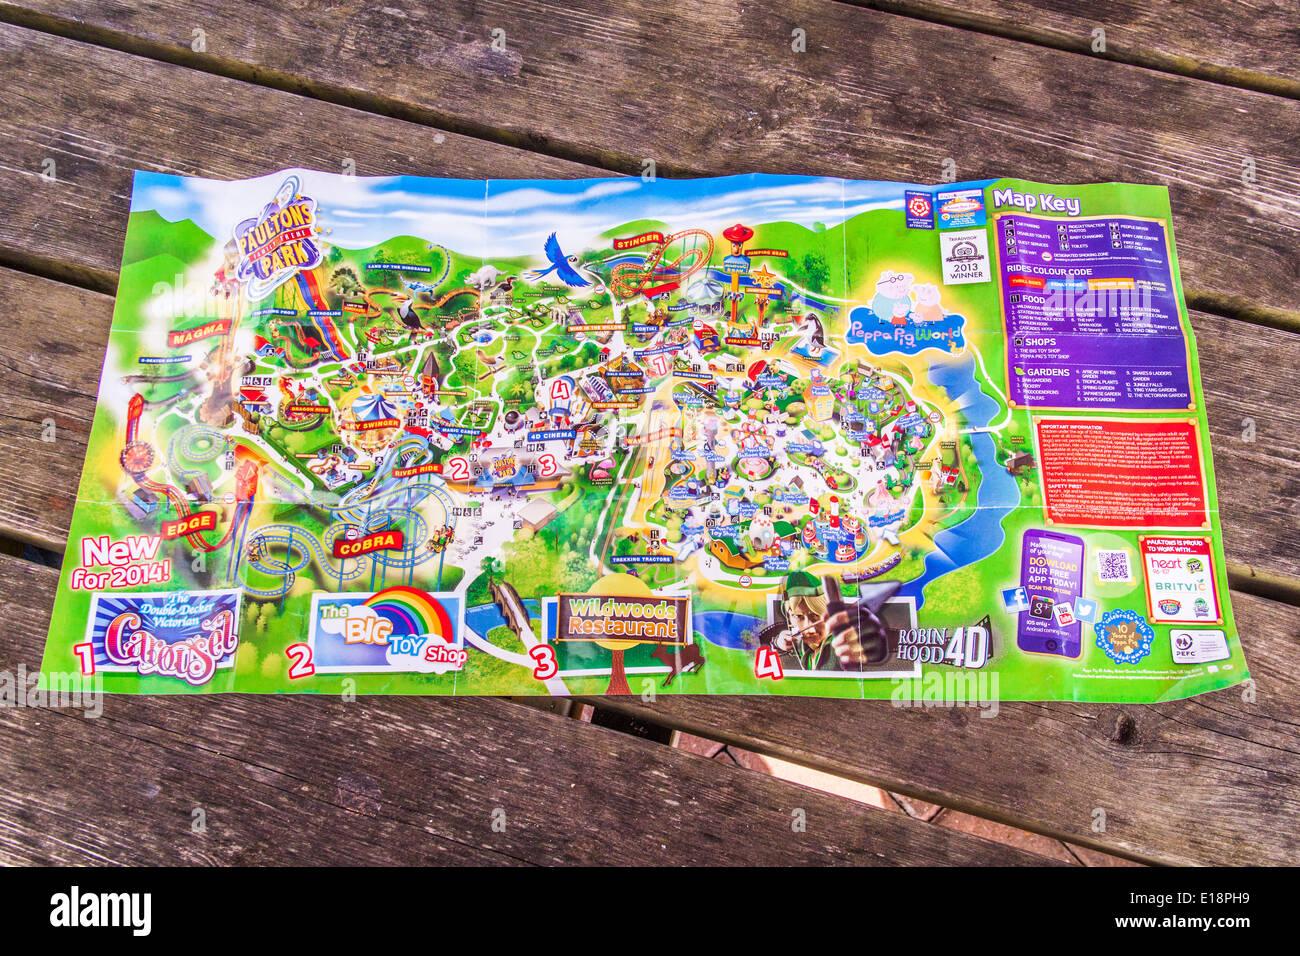 Paultons Park Map Map Of Paultons Park Stock Photos & Map Of Paultons Park Stock  Paultons Park Map